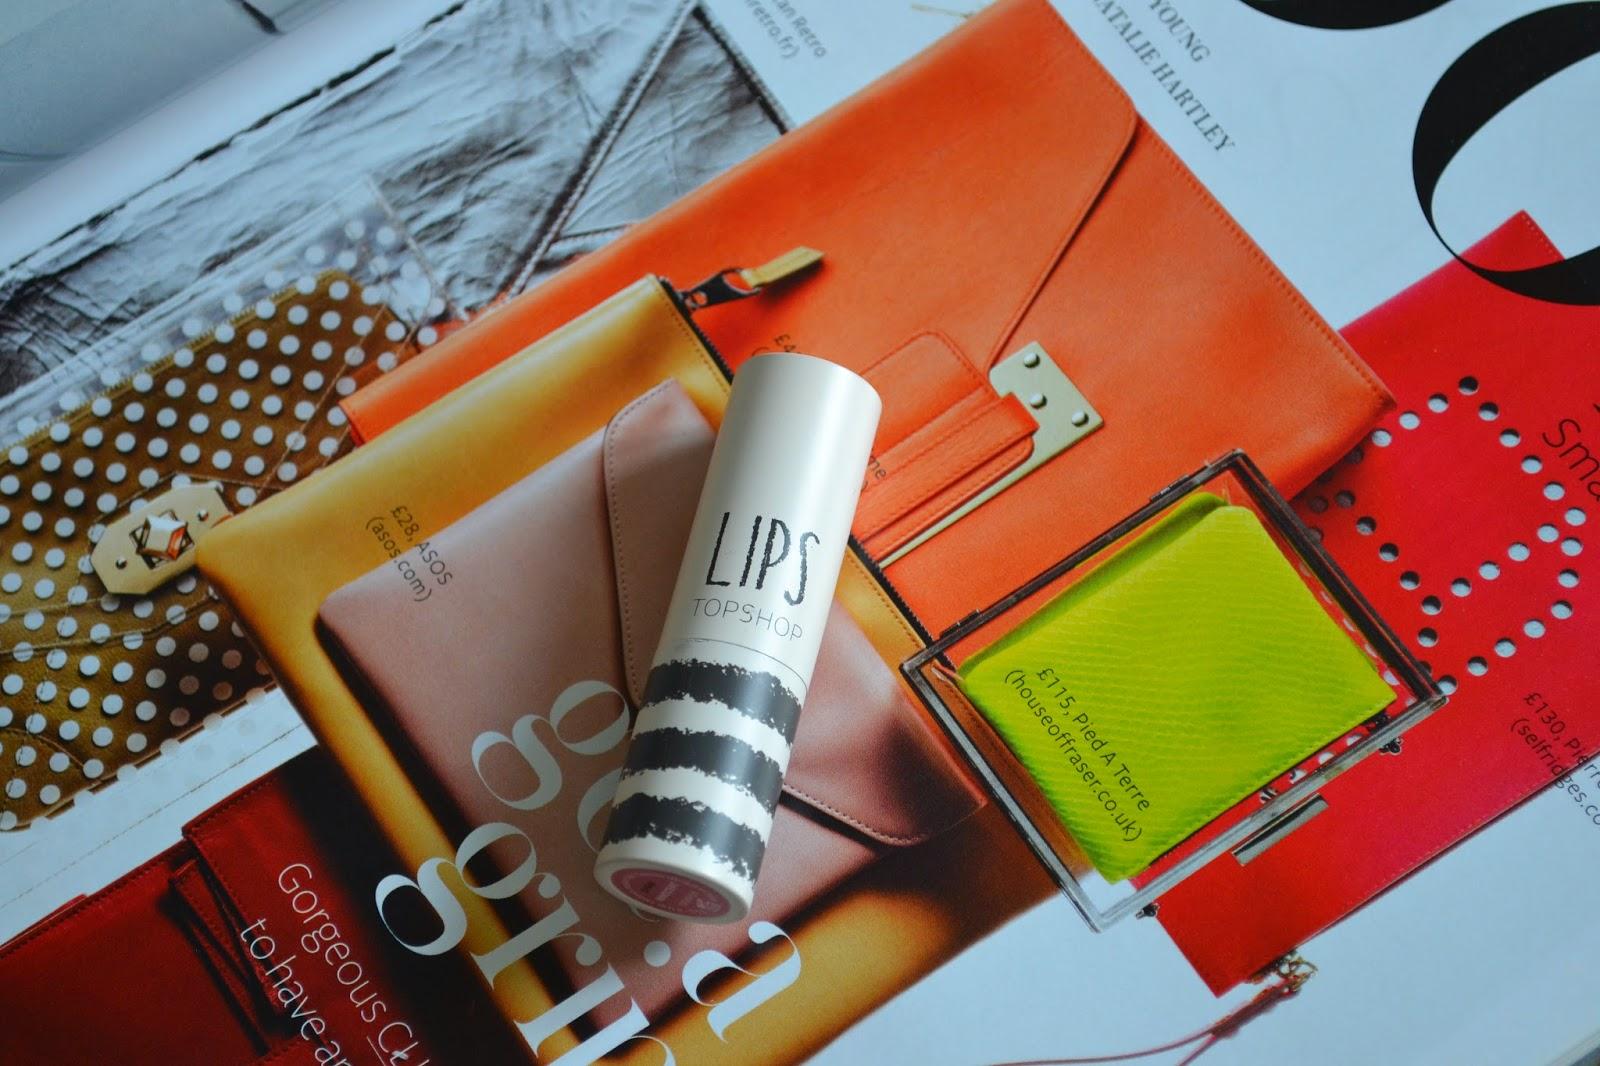 Topshop Lipstick in Innocent Review + Swatch - Aspiring Londoner